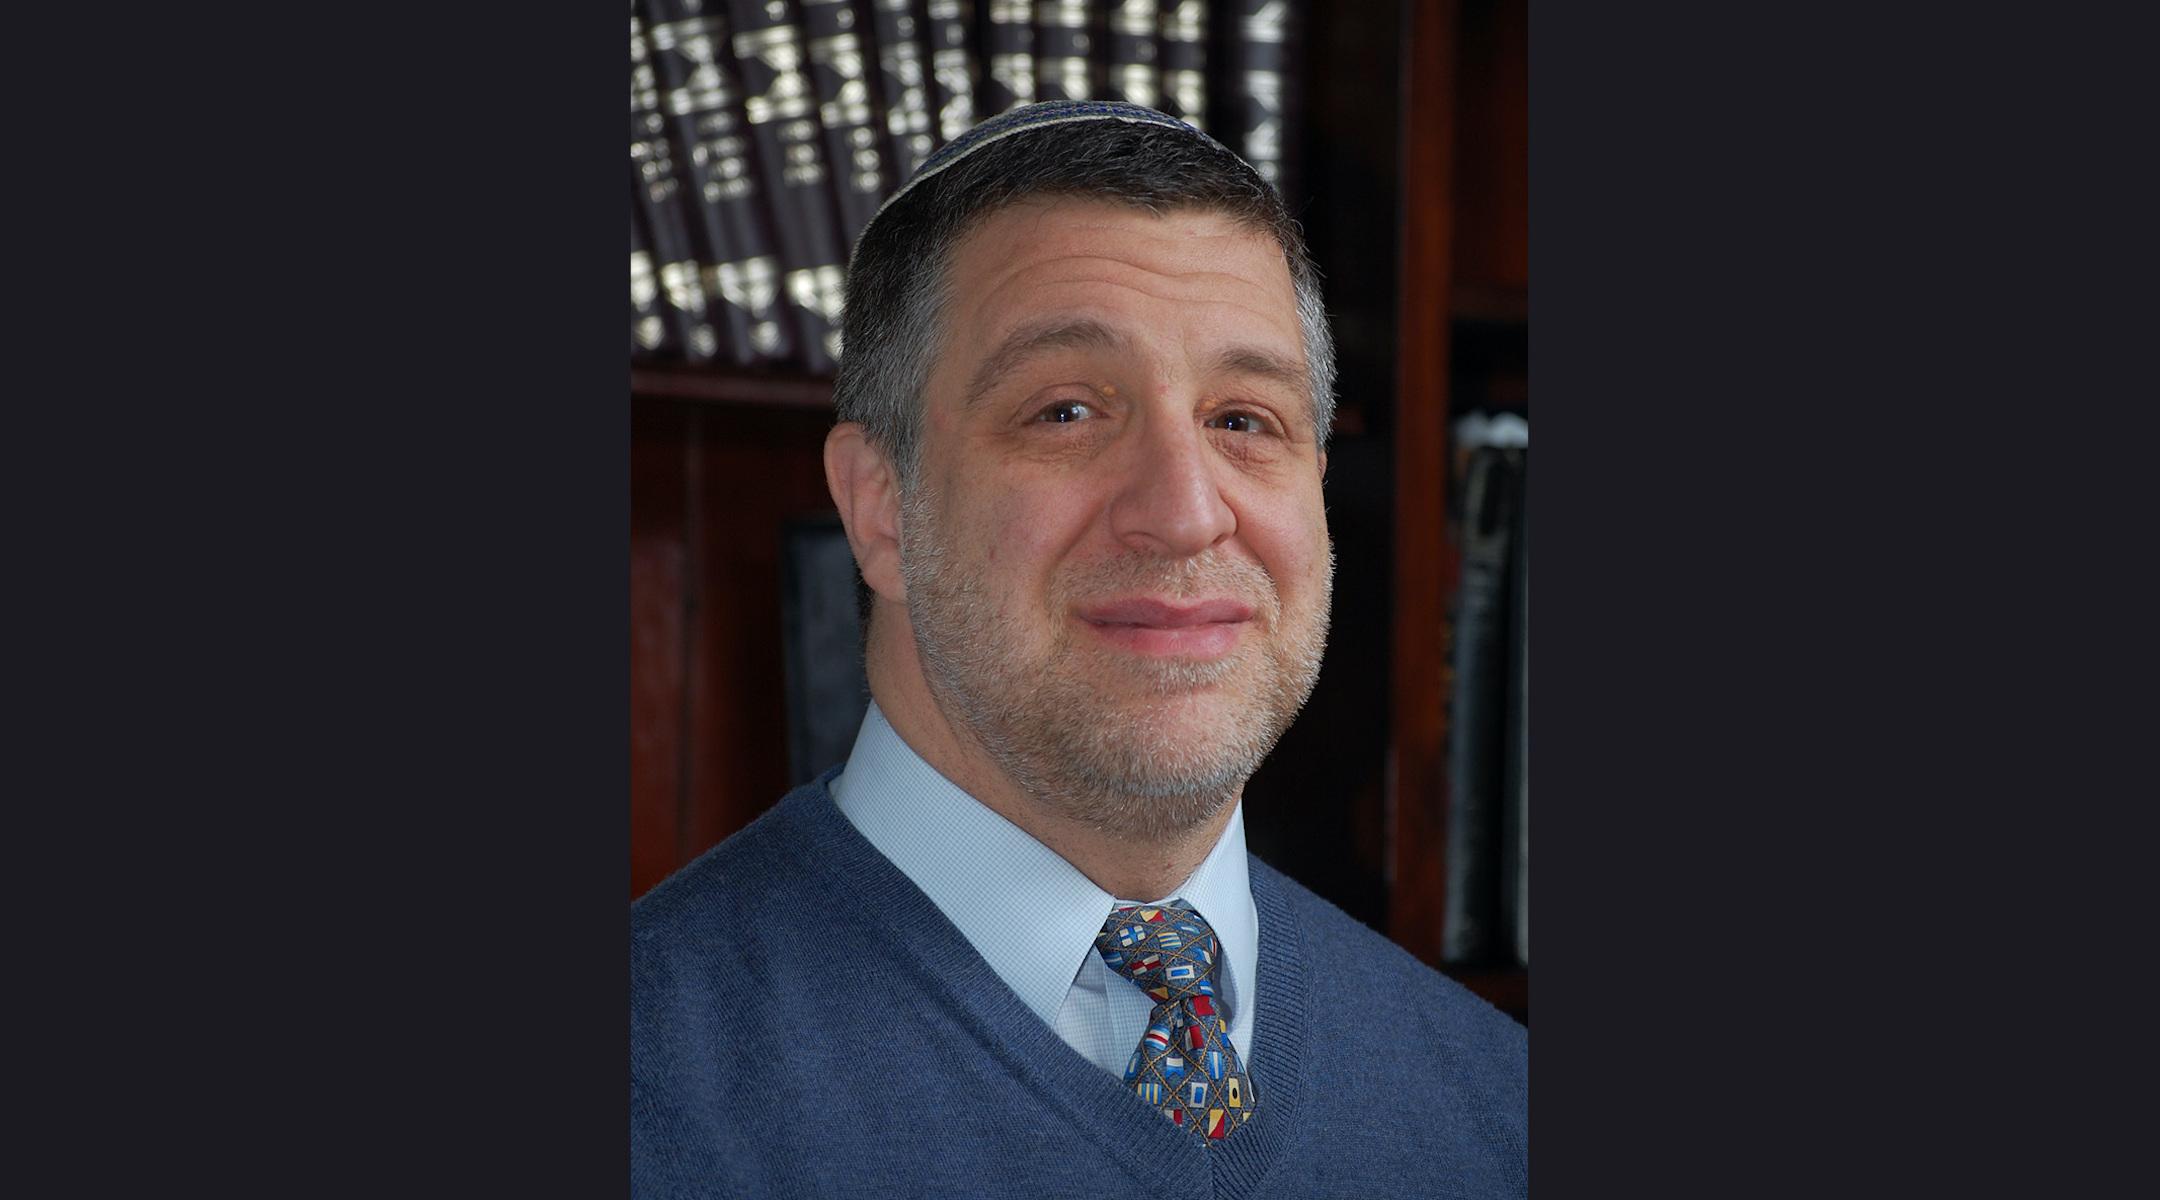 Meet a New York Orthodox rabbi voting for Biden